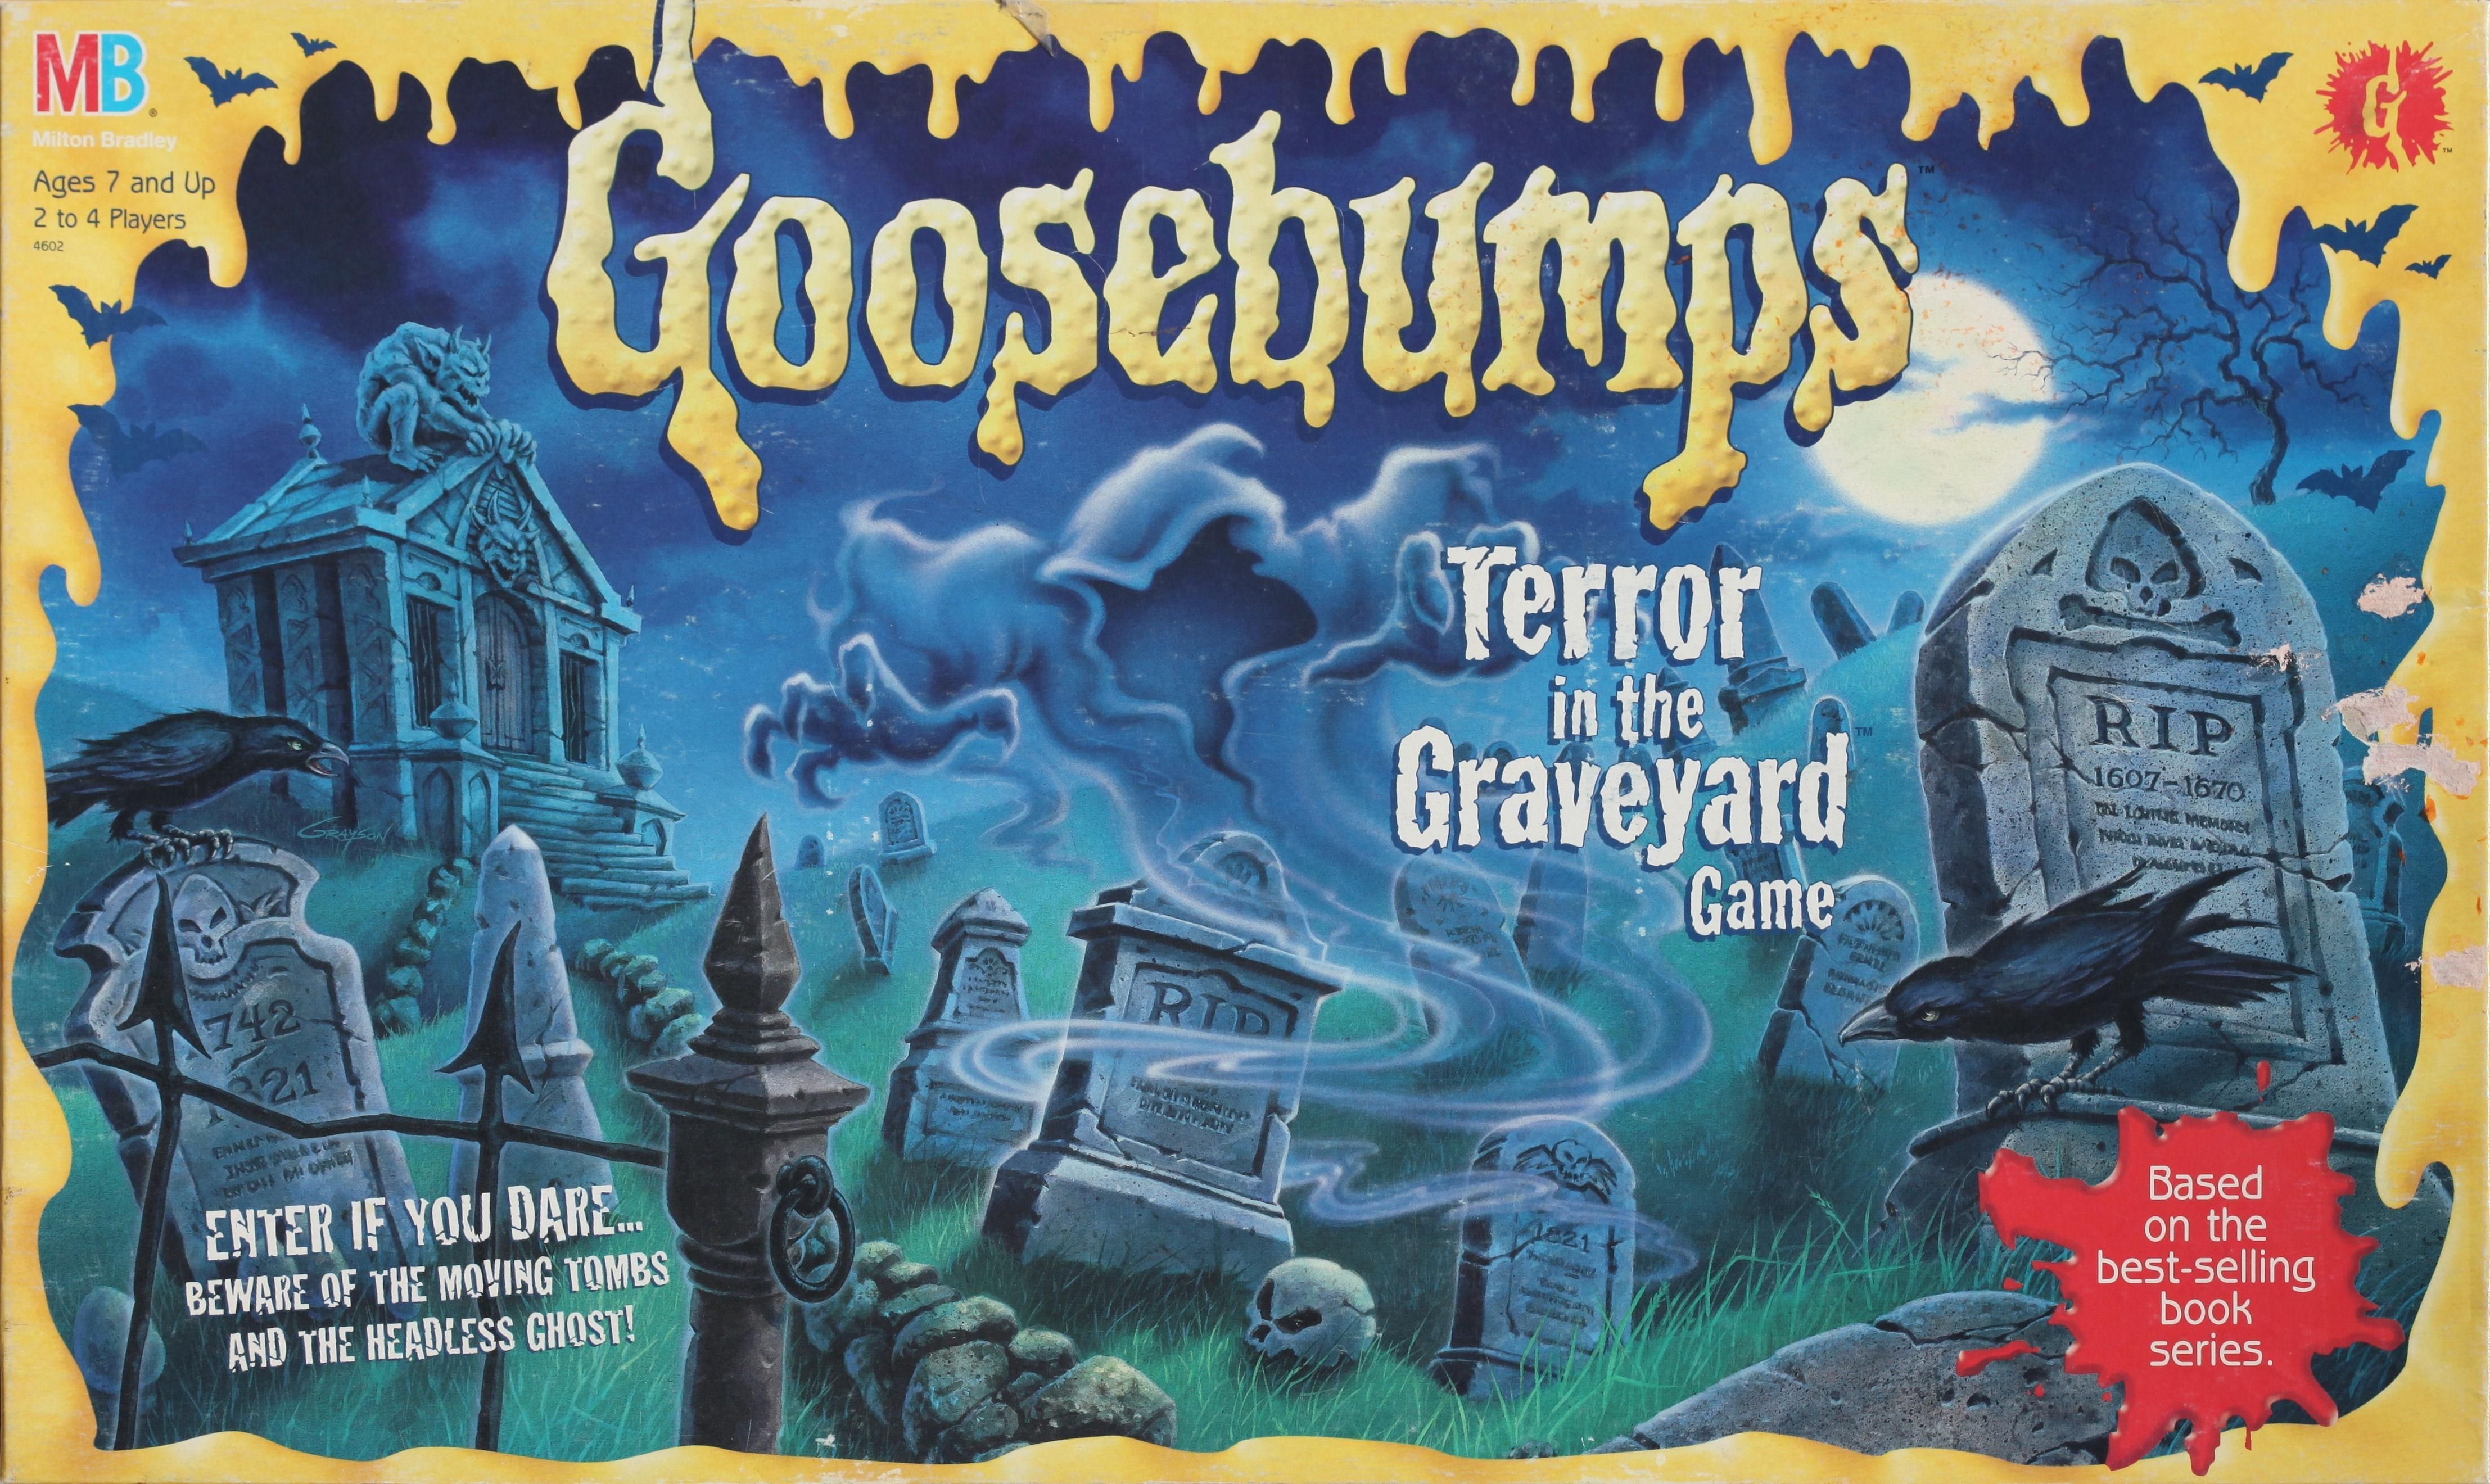 Goosebumps: Terror in the Graveyard Game